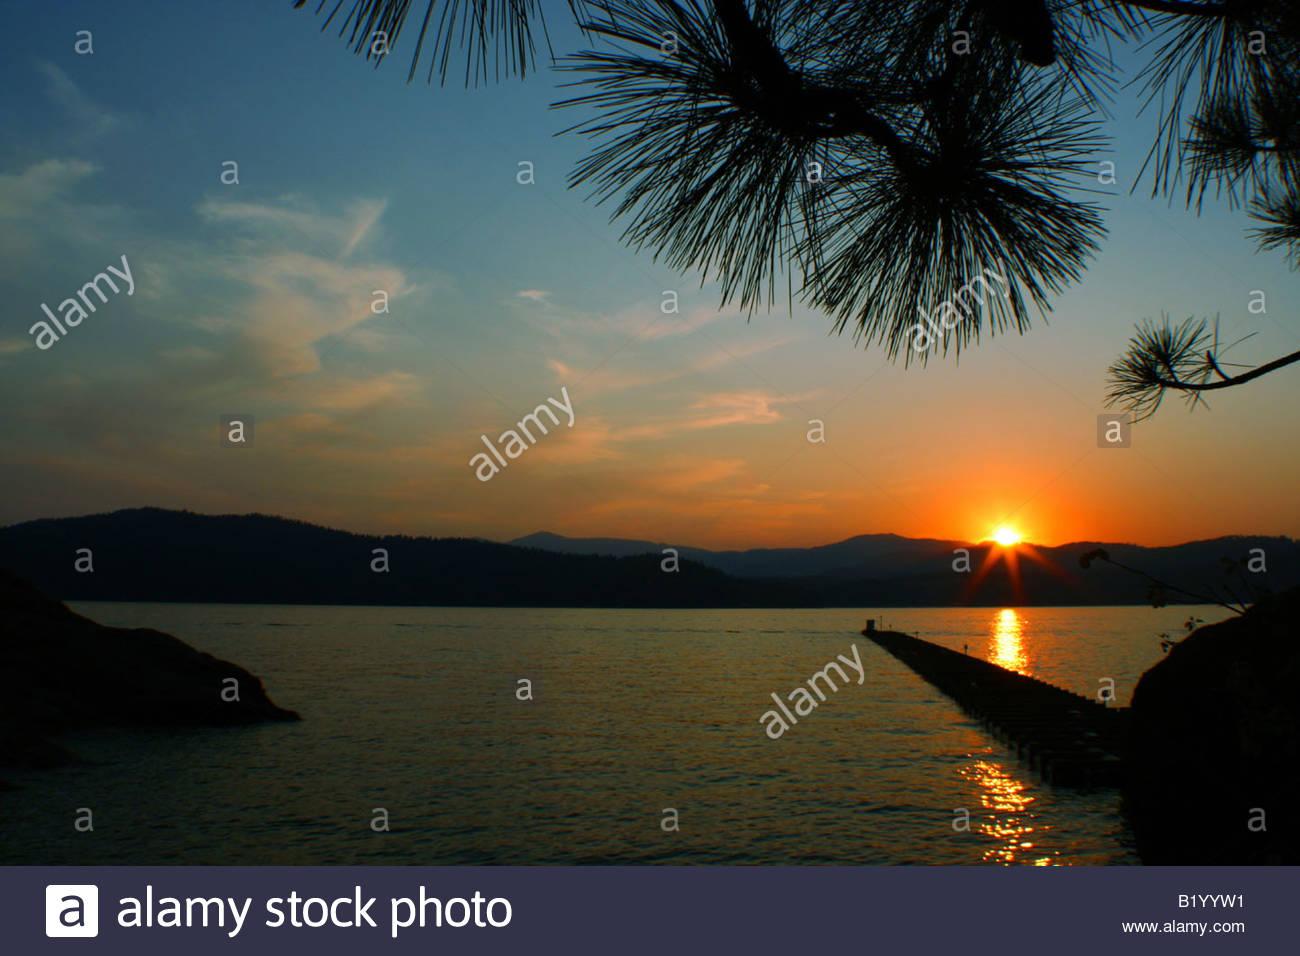 A Beautiful sunset over a lake. - Stock Image